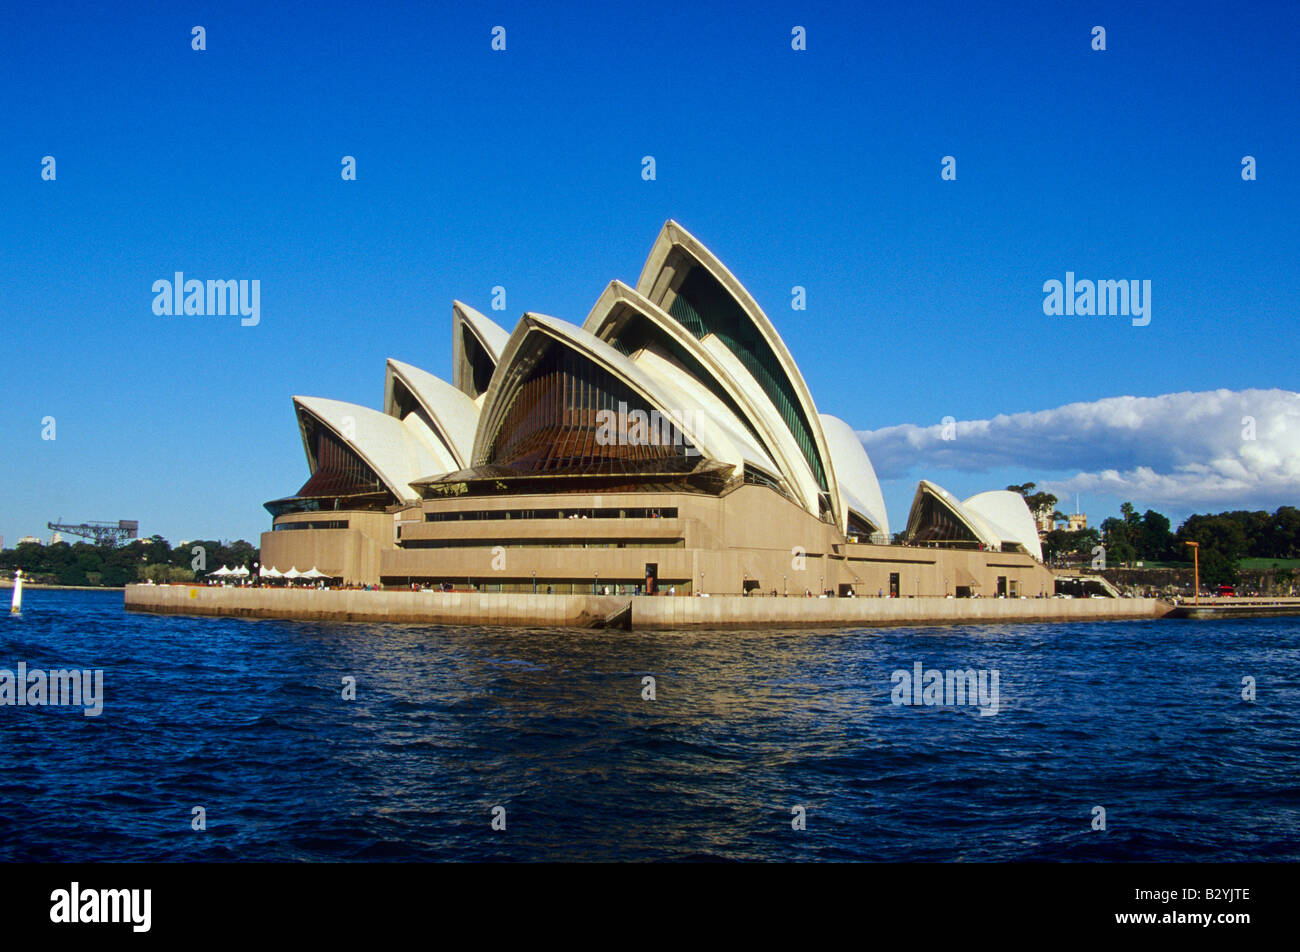 Sydney Opera House designed by JÃ rn Utzon - Stock Image